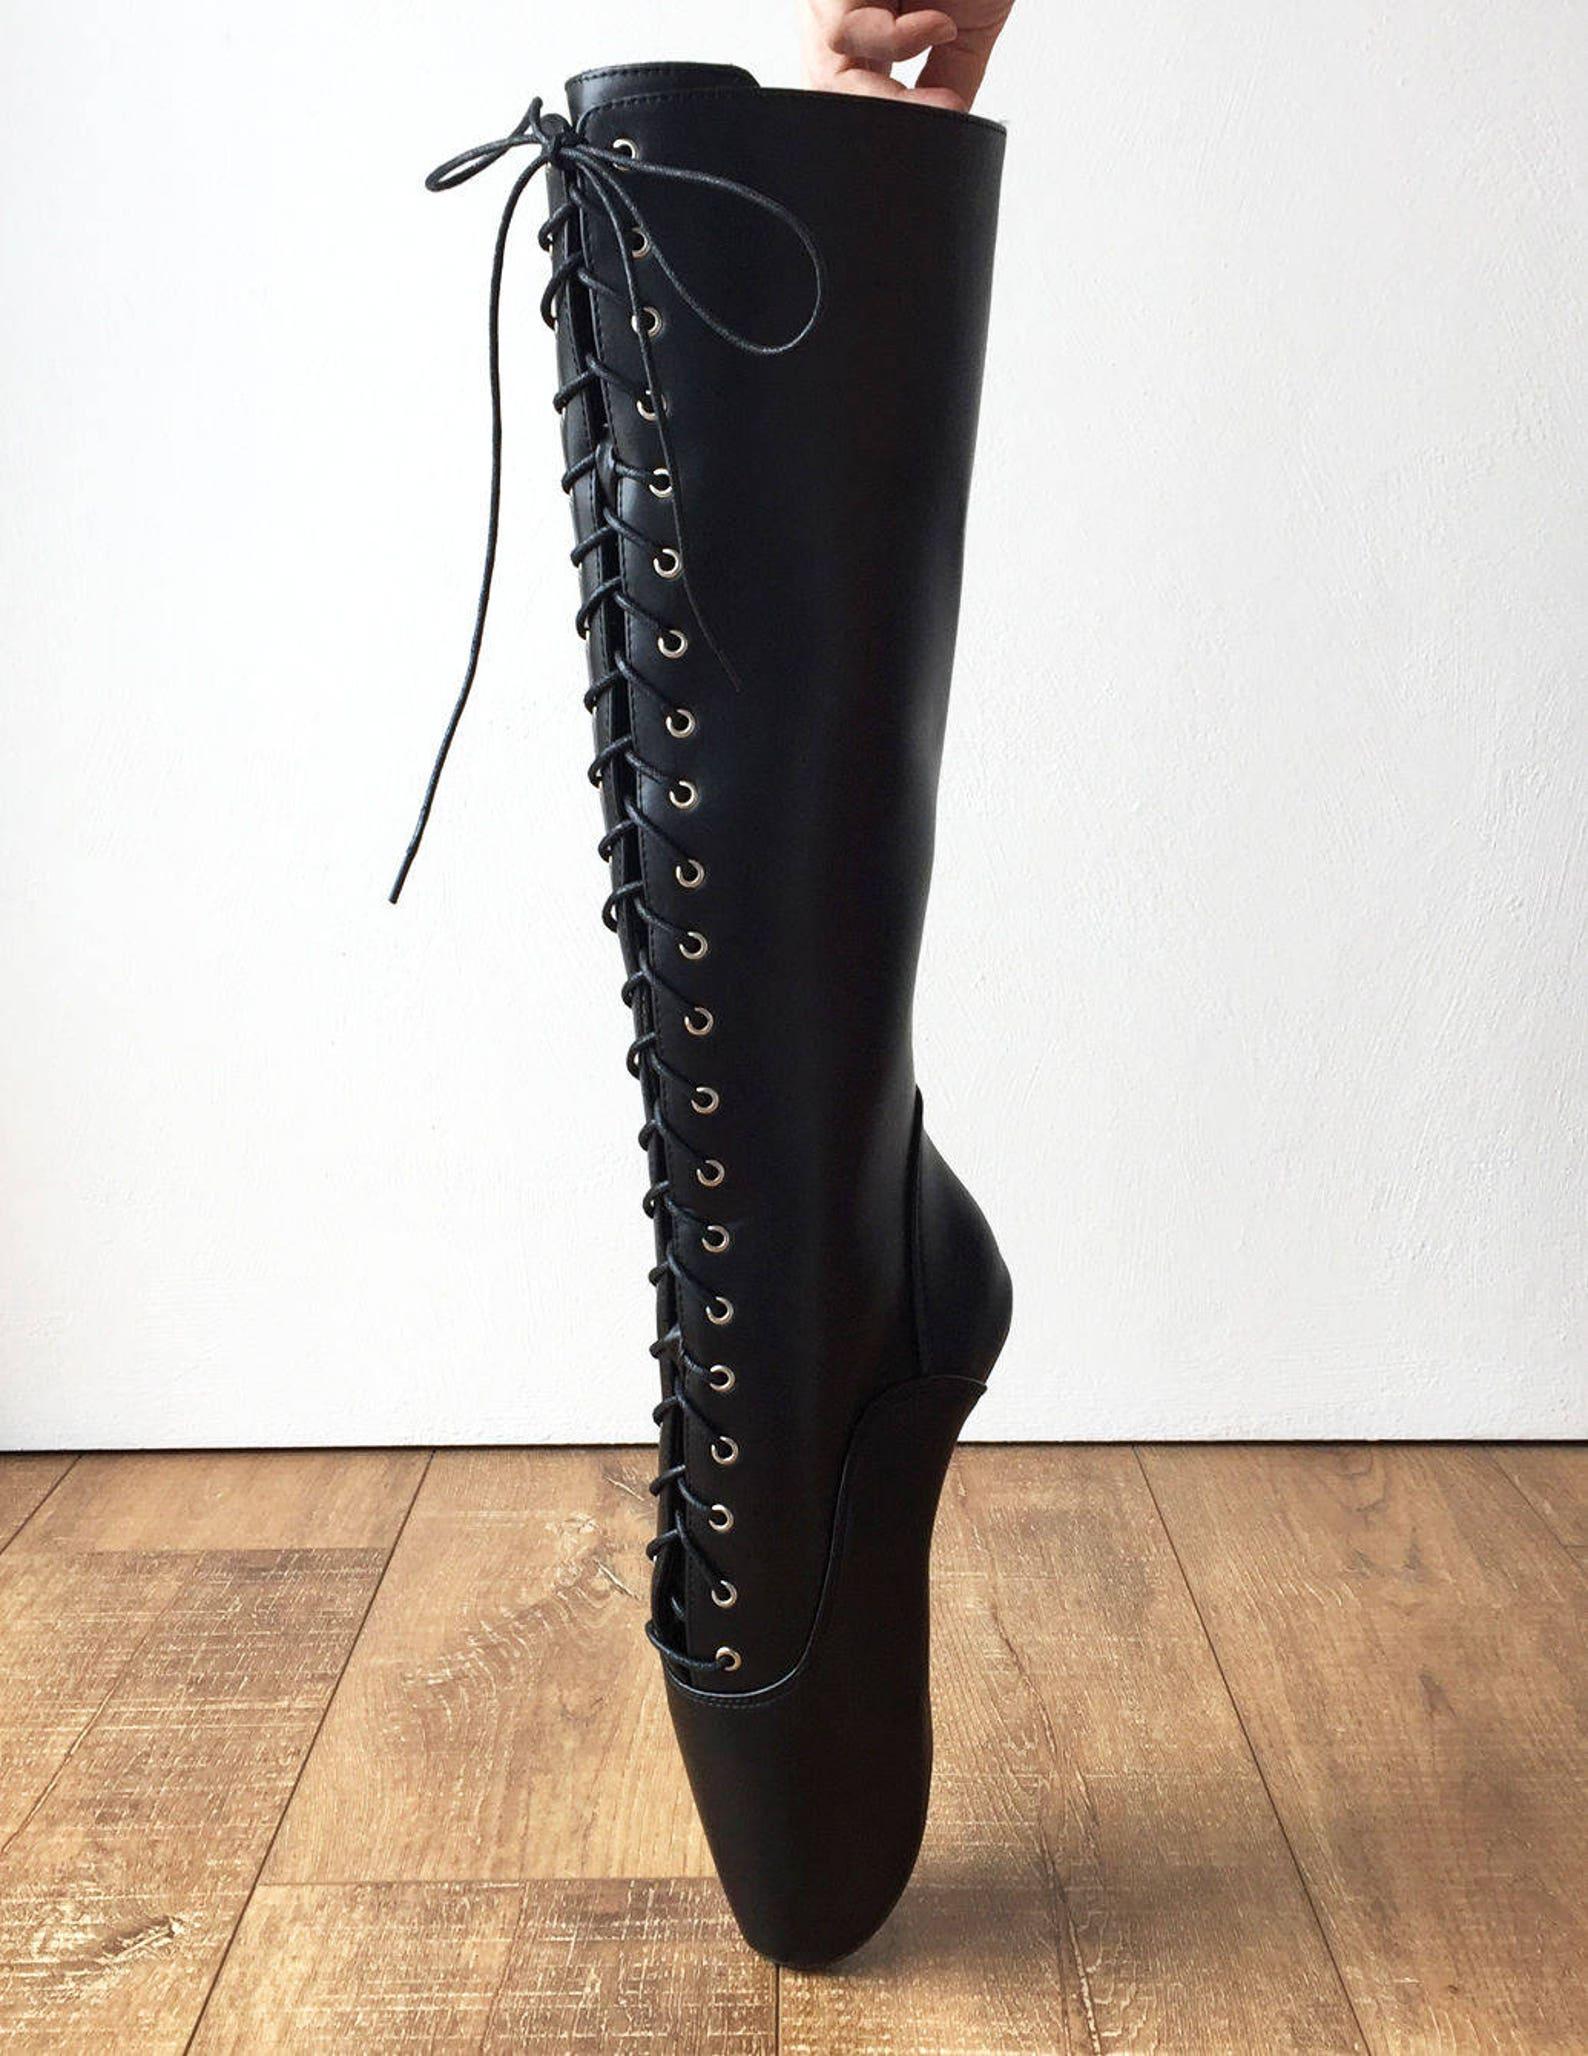 pointe (no zip) heelless lace up knee high ballet fetish pain boots black matte